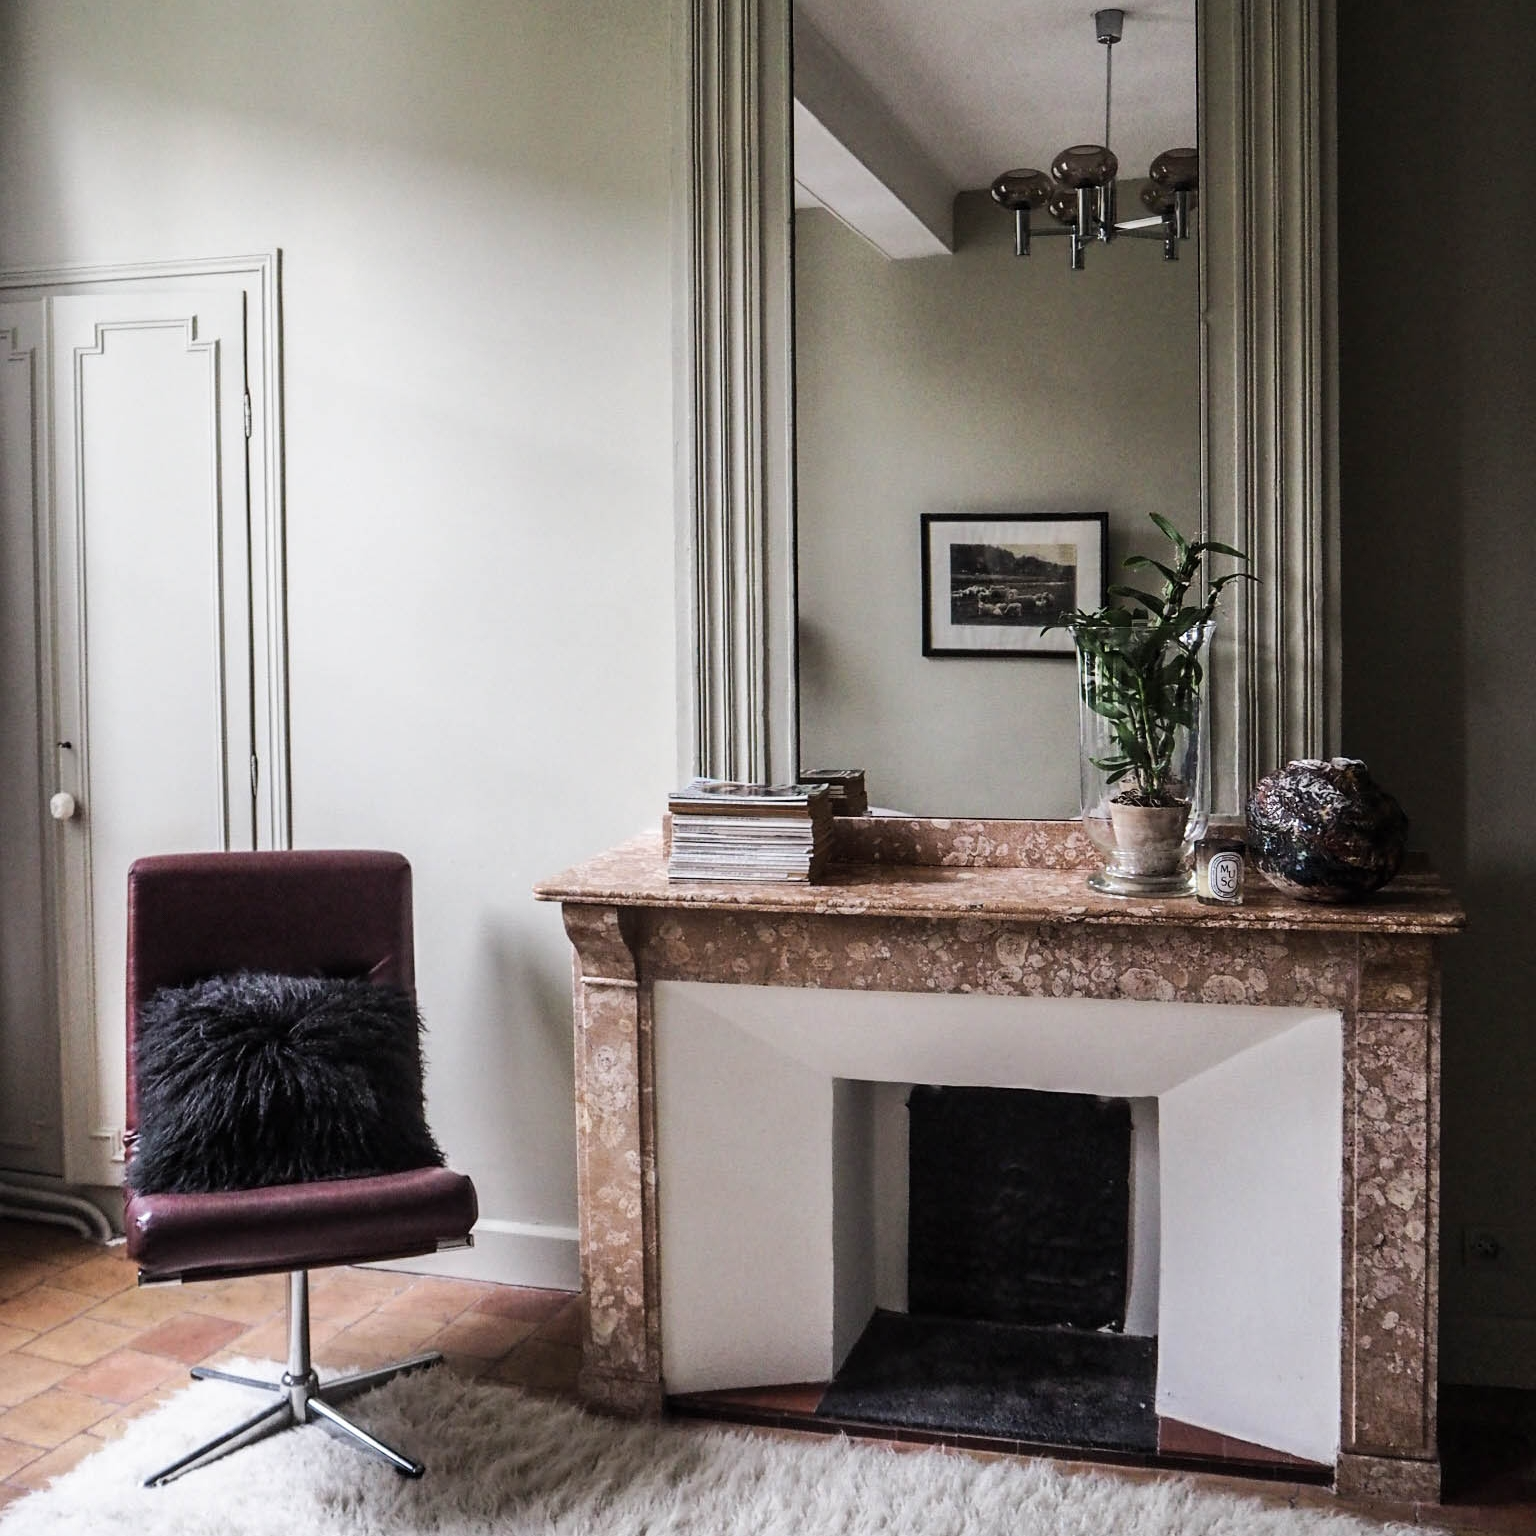 camellas-lloret-maison-d'hotes-room-1-fireplace.jpg